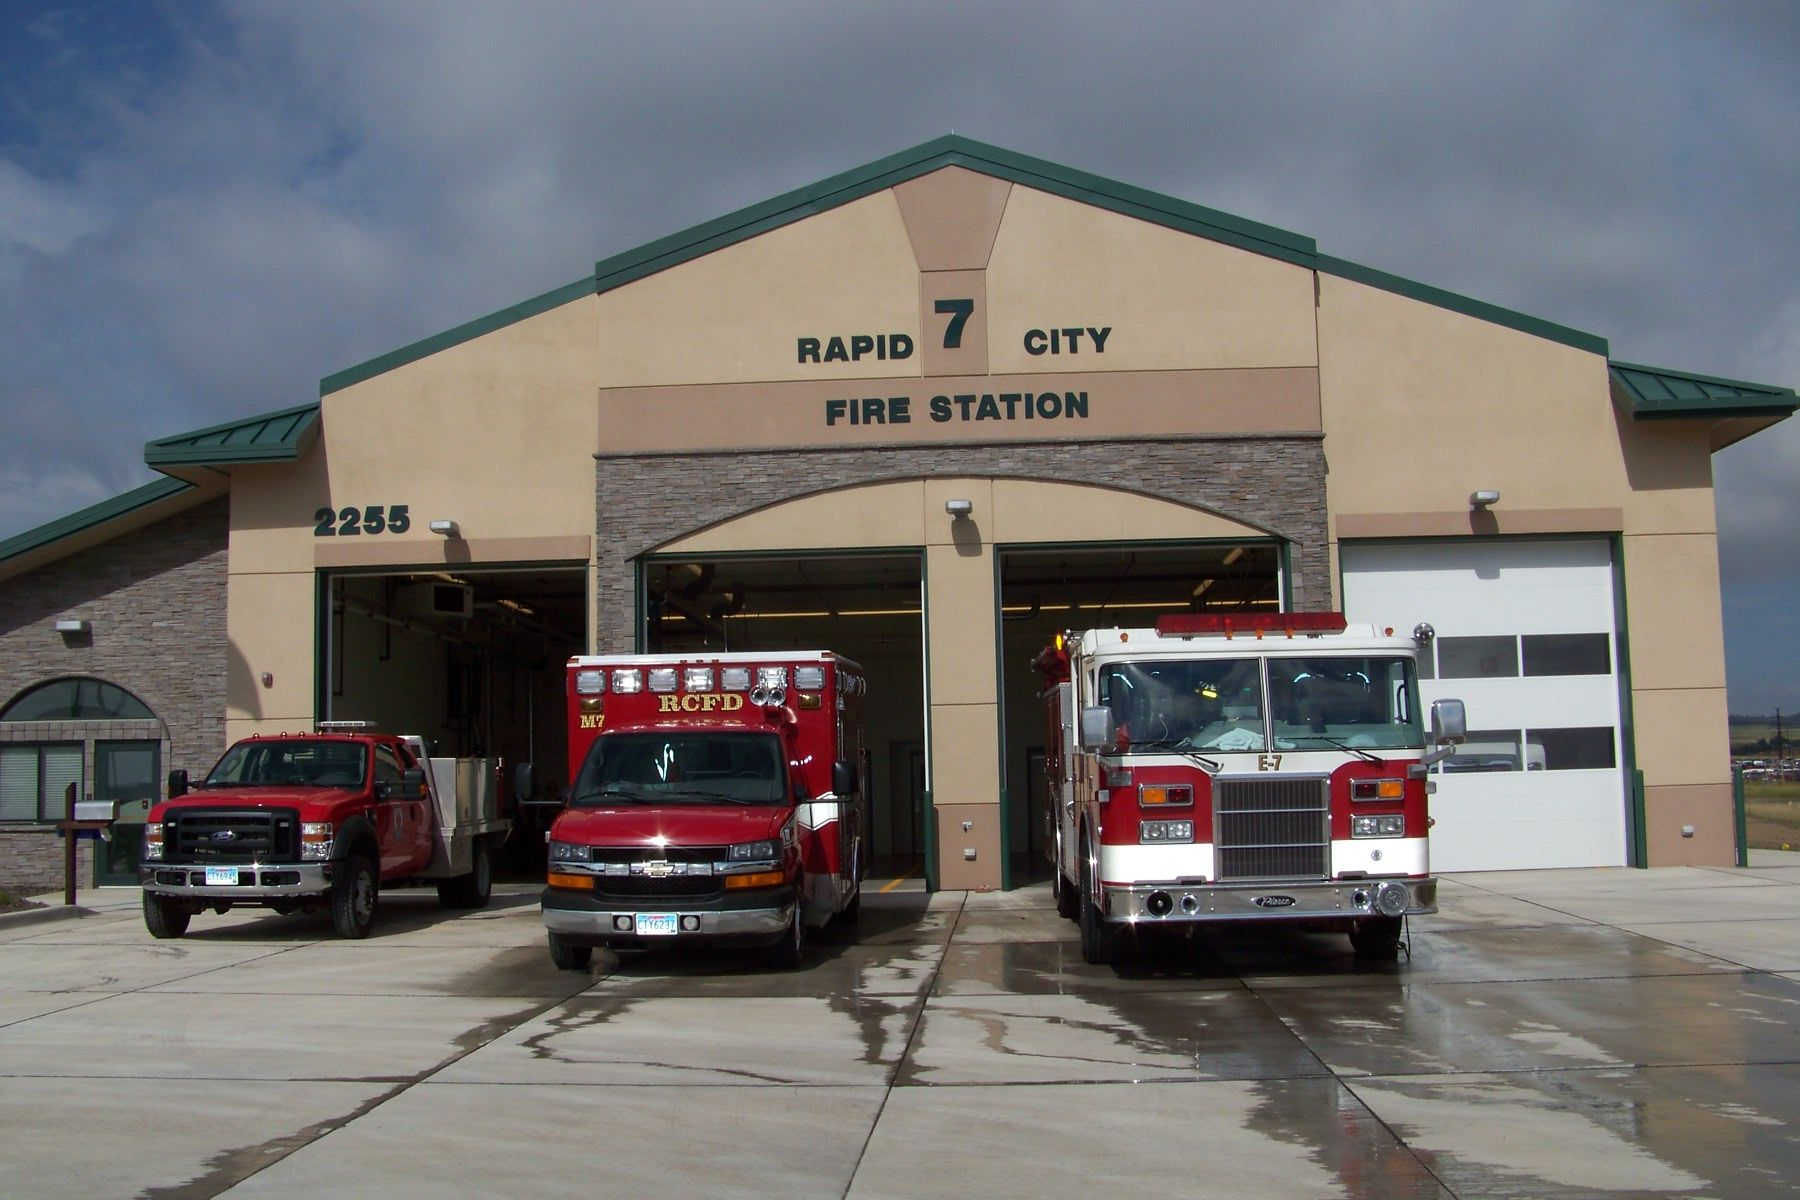 fire station kenneth bluew - HD1800×1200